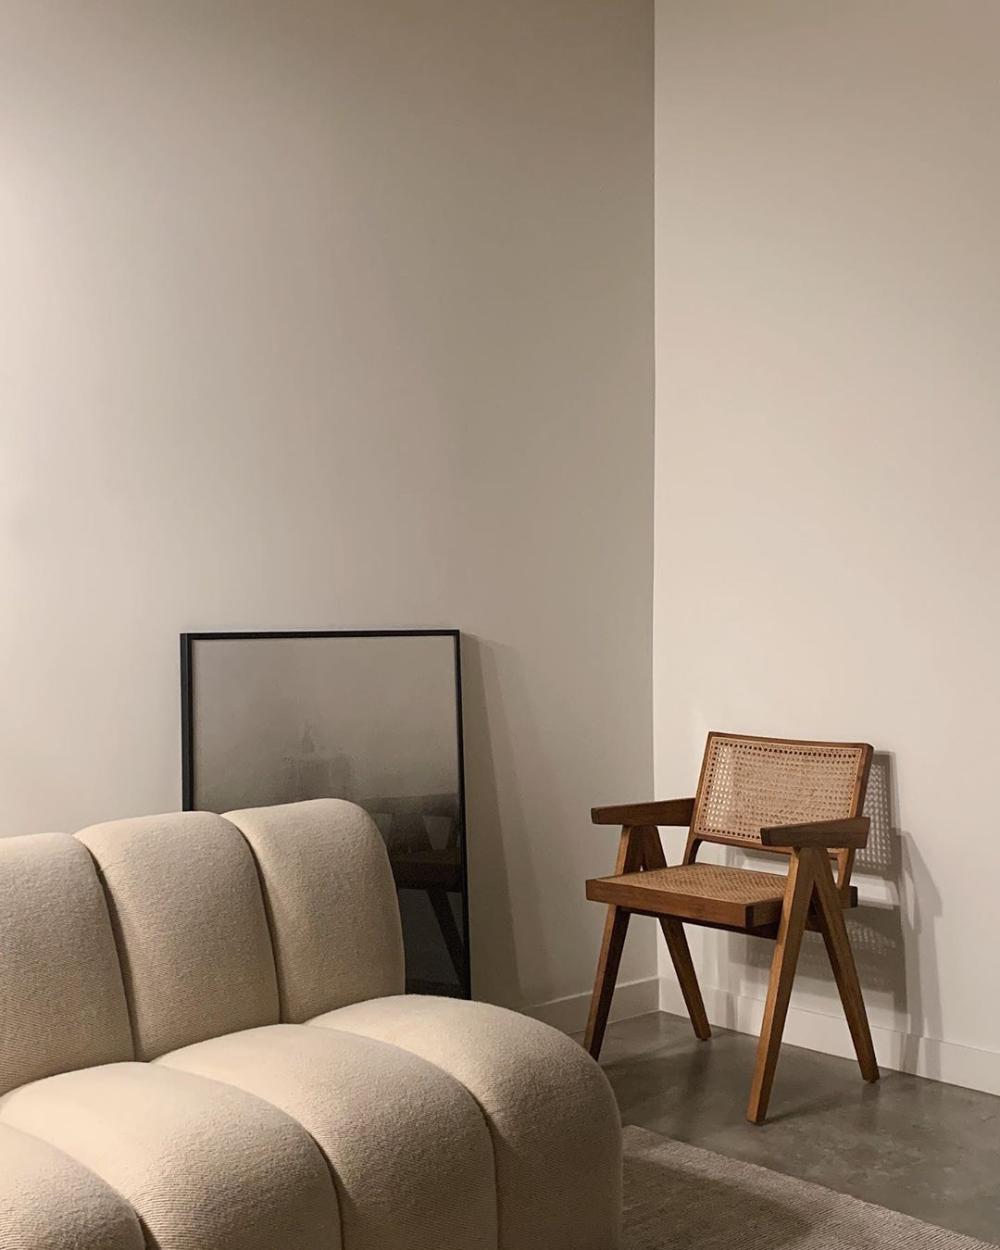 Amee Amee Kim Instagram Photos And Videos Cheap Home Decor House Interior Interior